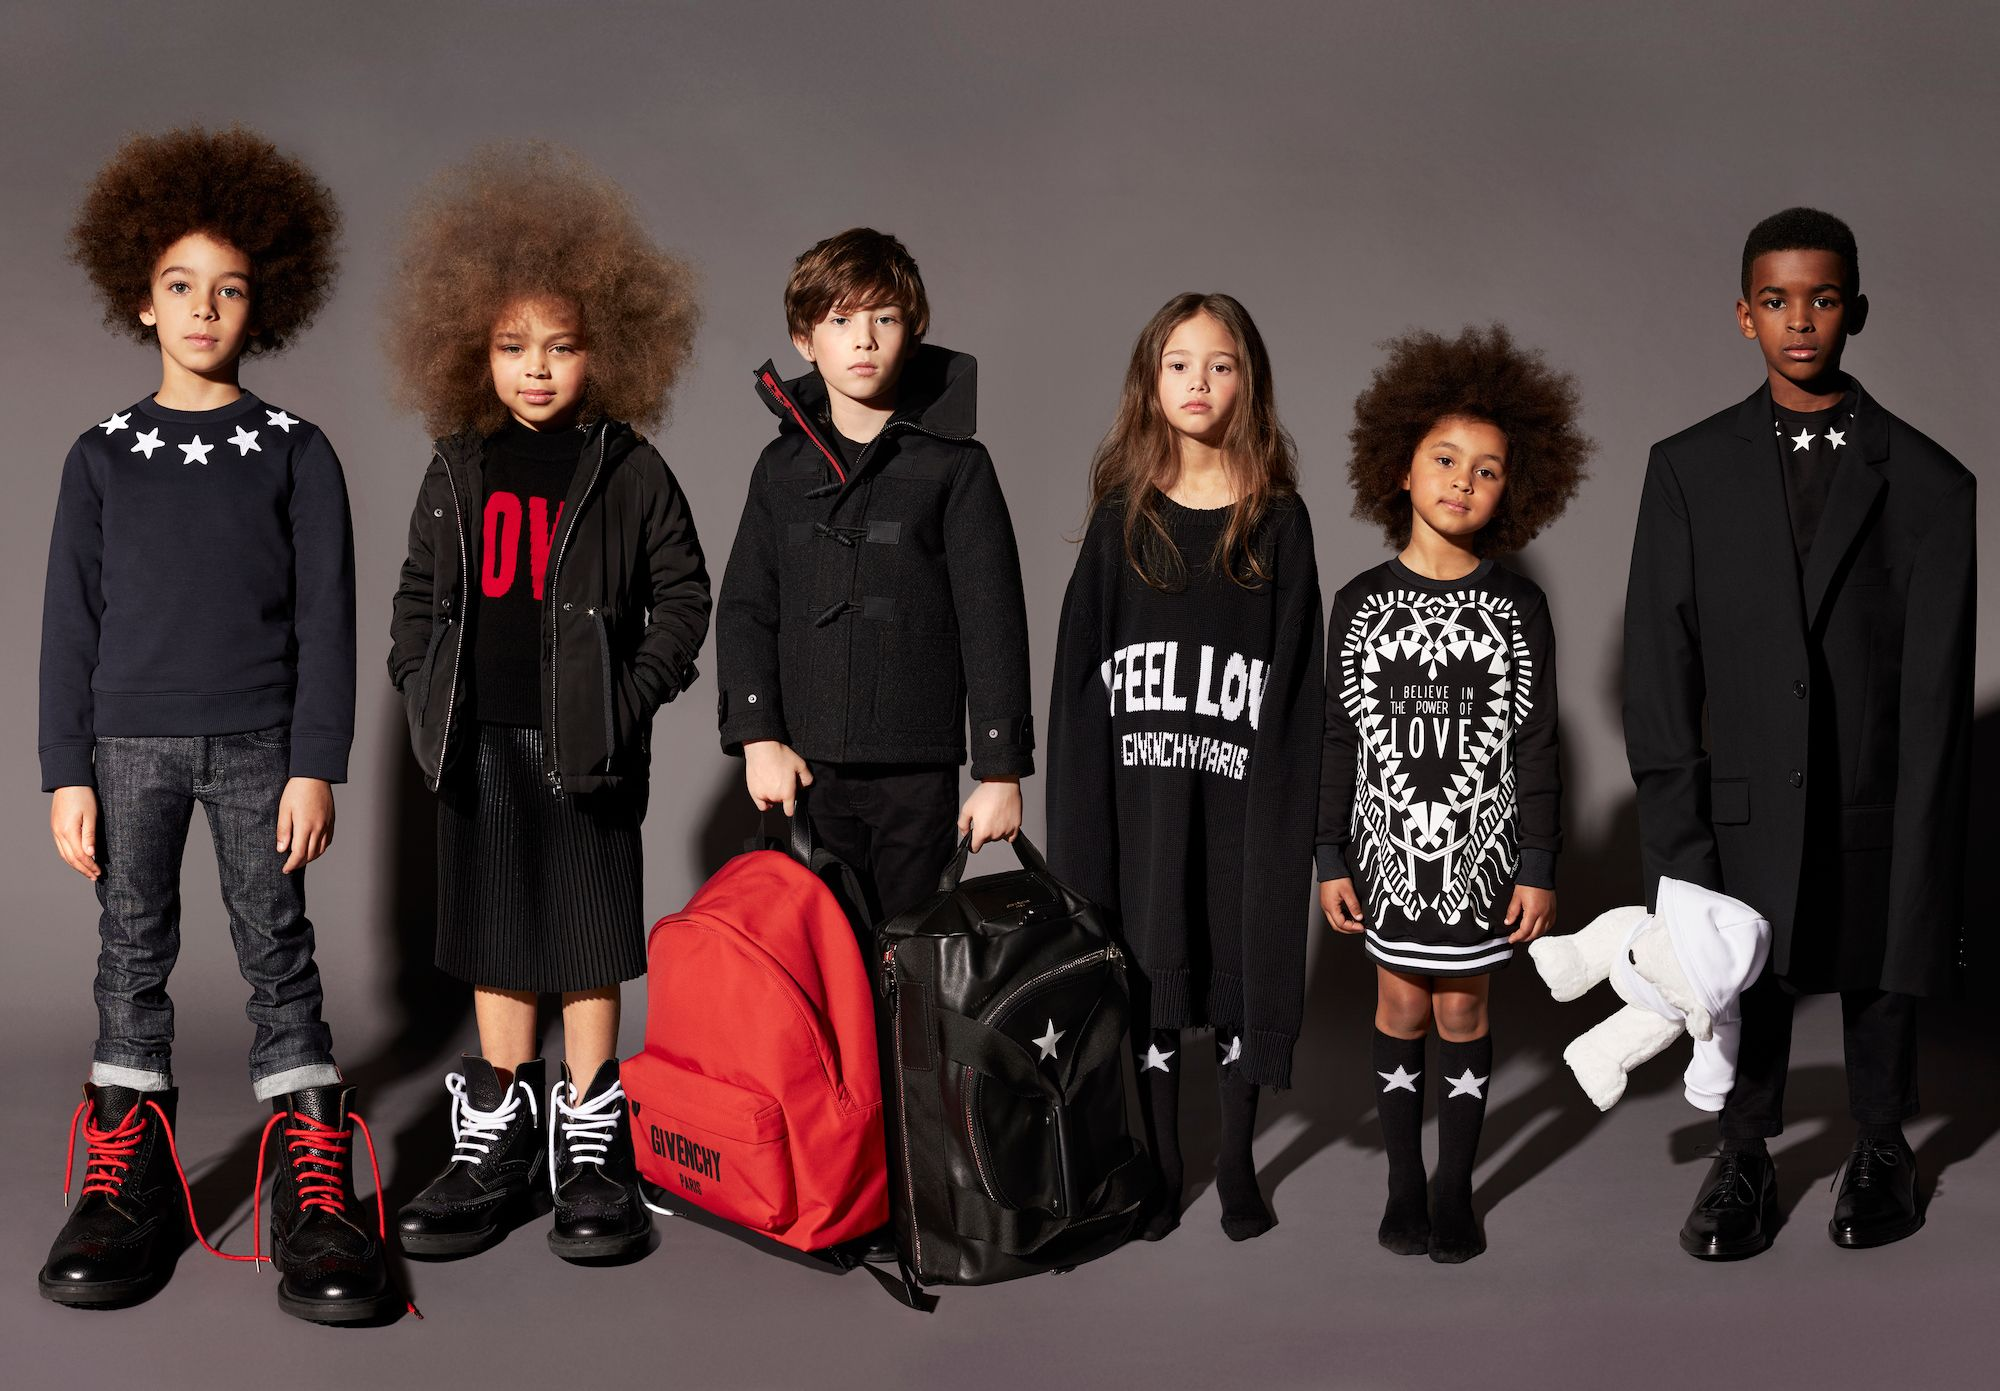 Dress up fashion girl